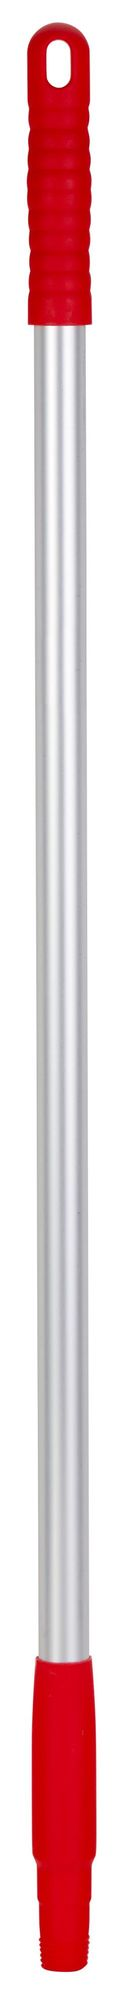 Vikan hygiëne steel 84cm rood -   29314